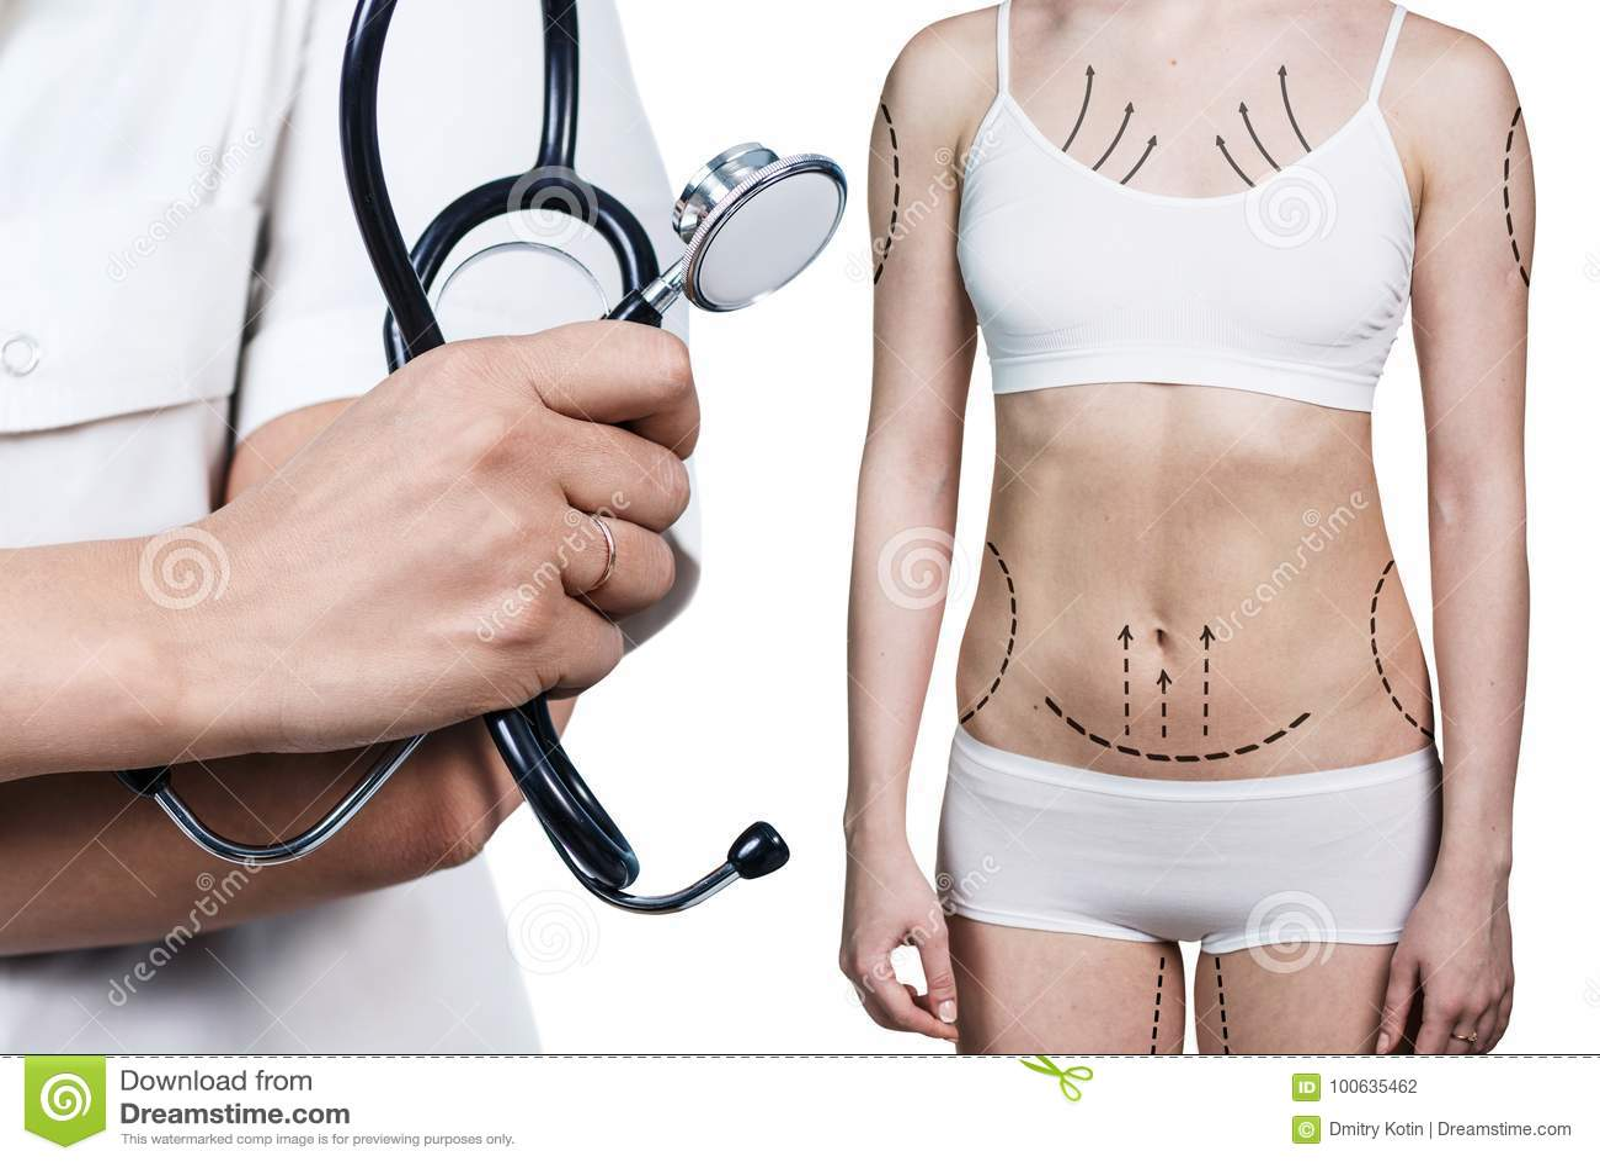 Cirugia de perdida de peso